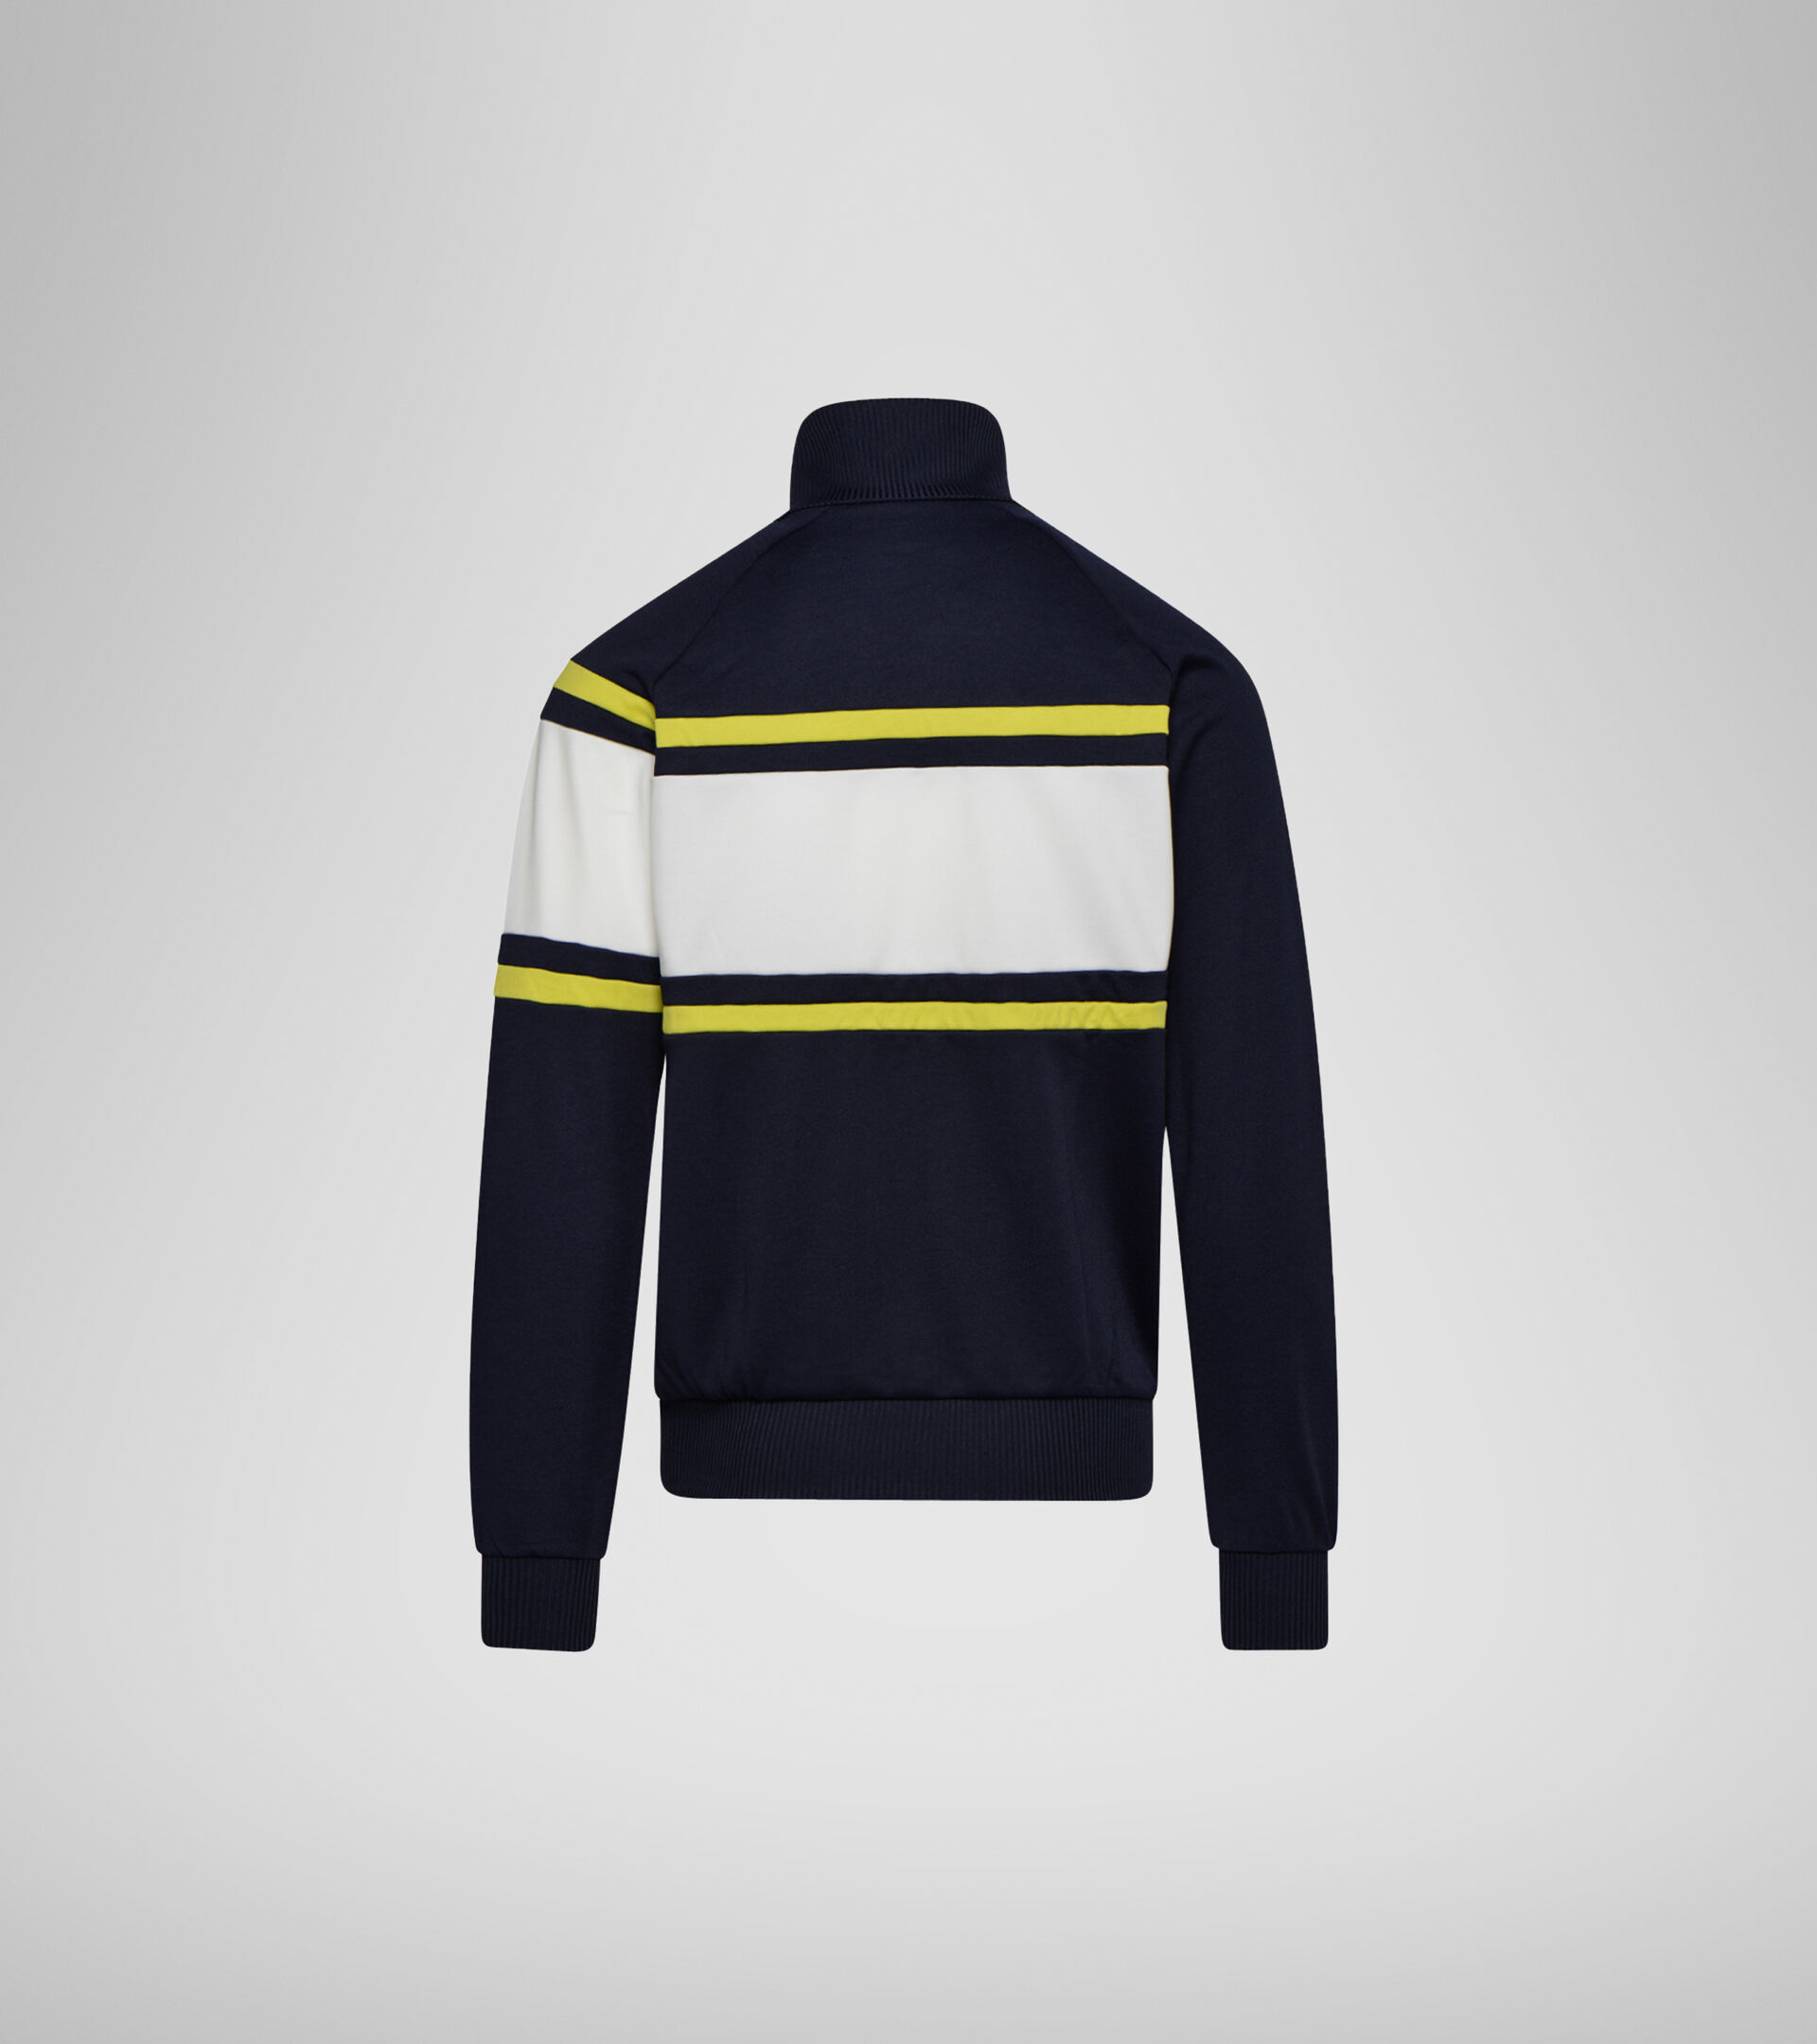 Sportswear jacket - Unisex JACKET 80S CLASSIC NAVY - Diadora